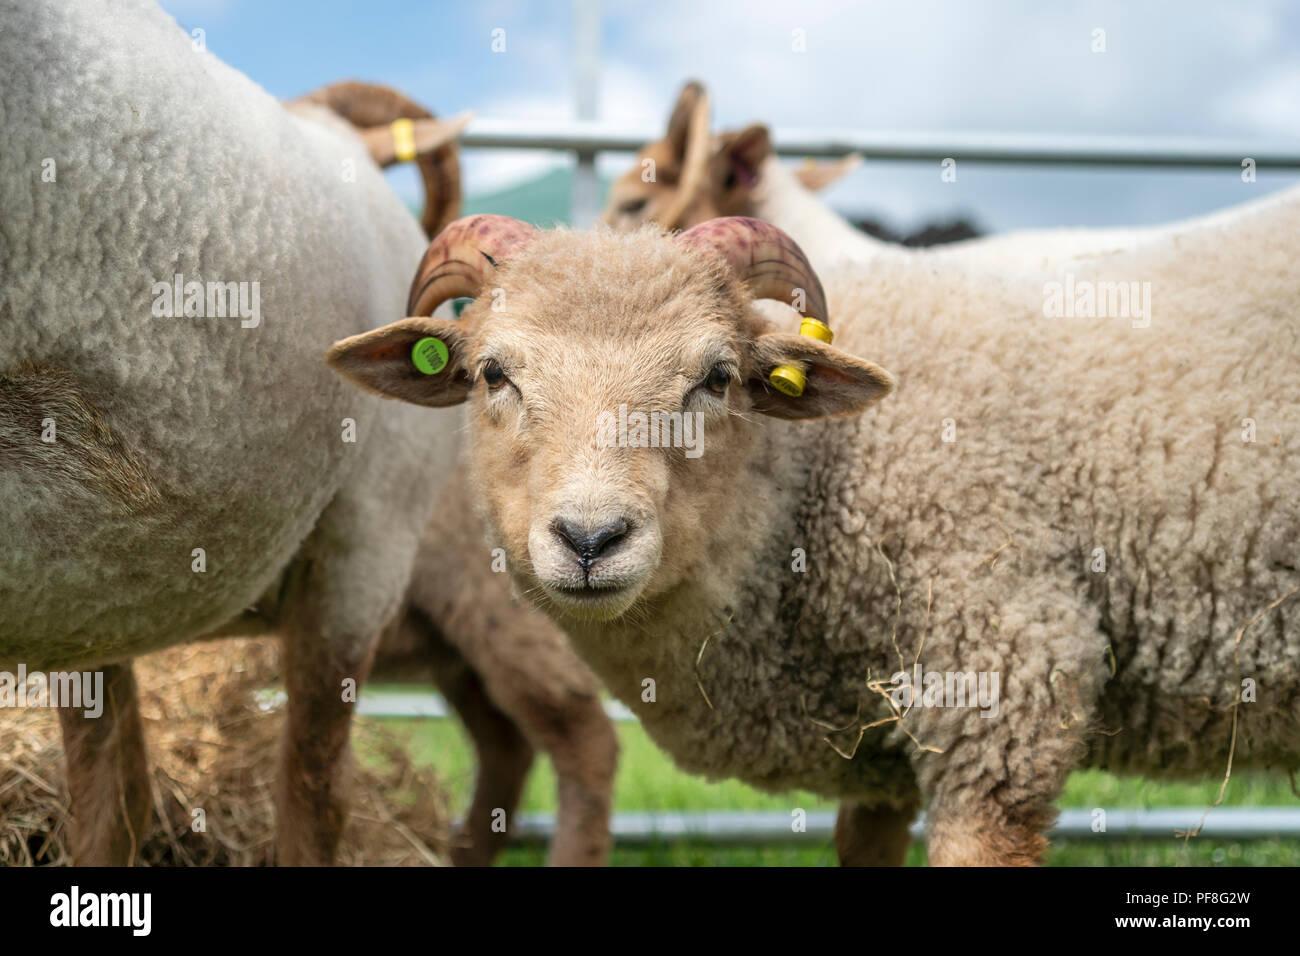 Portland sheep lamb on display at the Northumberland County Show 2018, Bywell, Northumberland, England - Stock Image